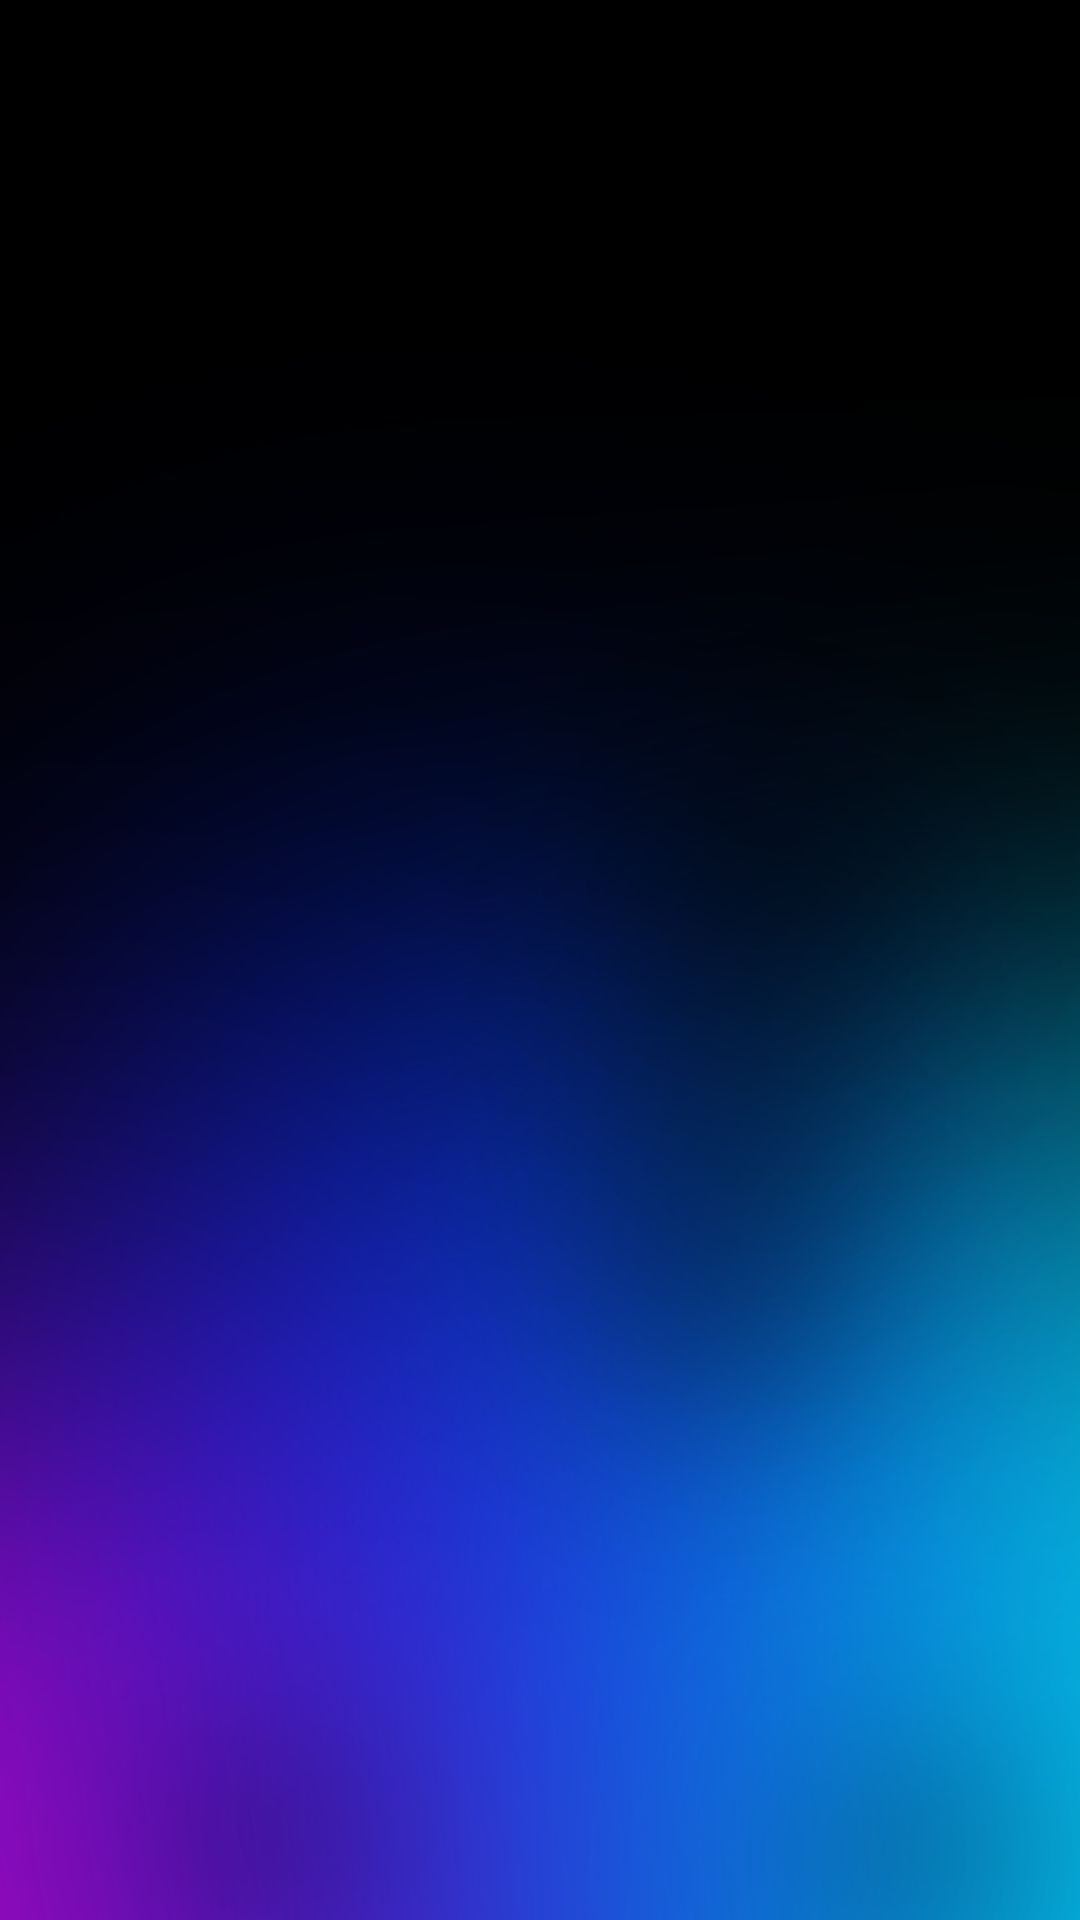 Dark Blue Background Images Hd